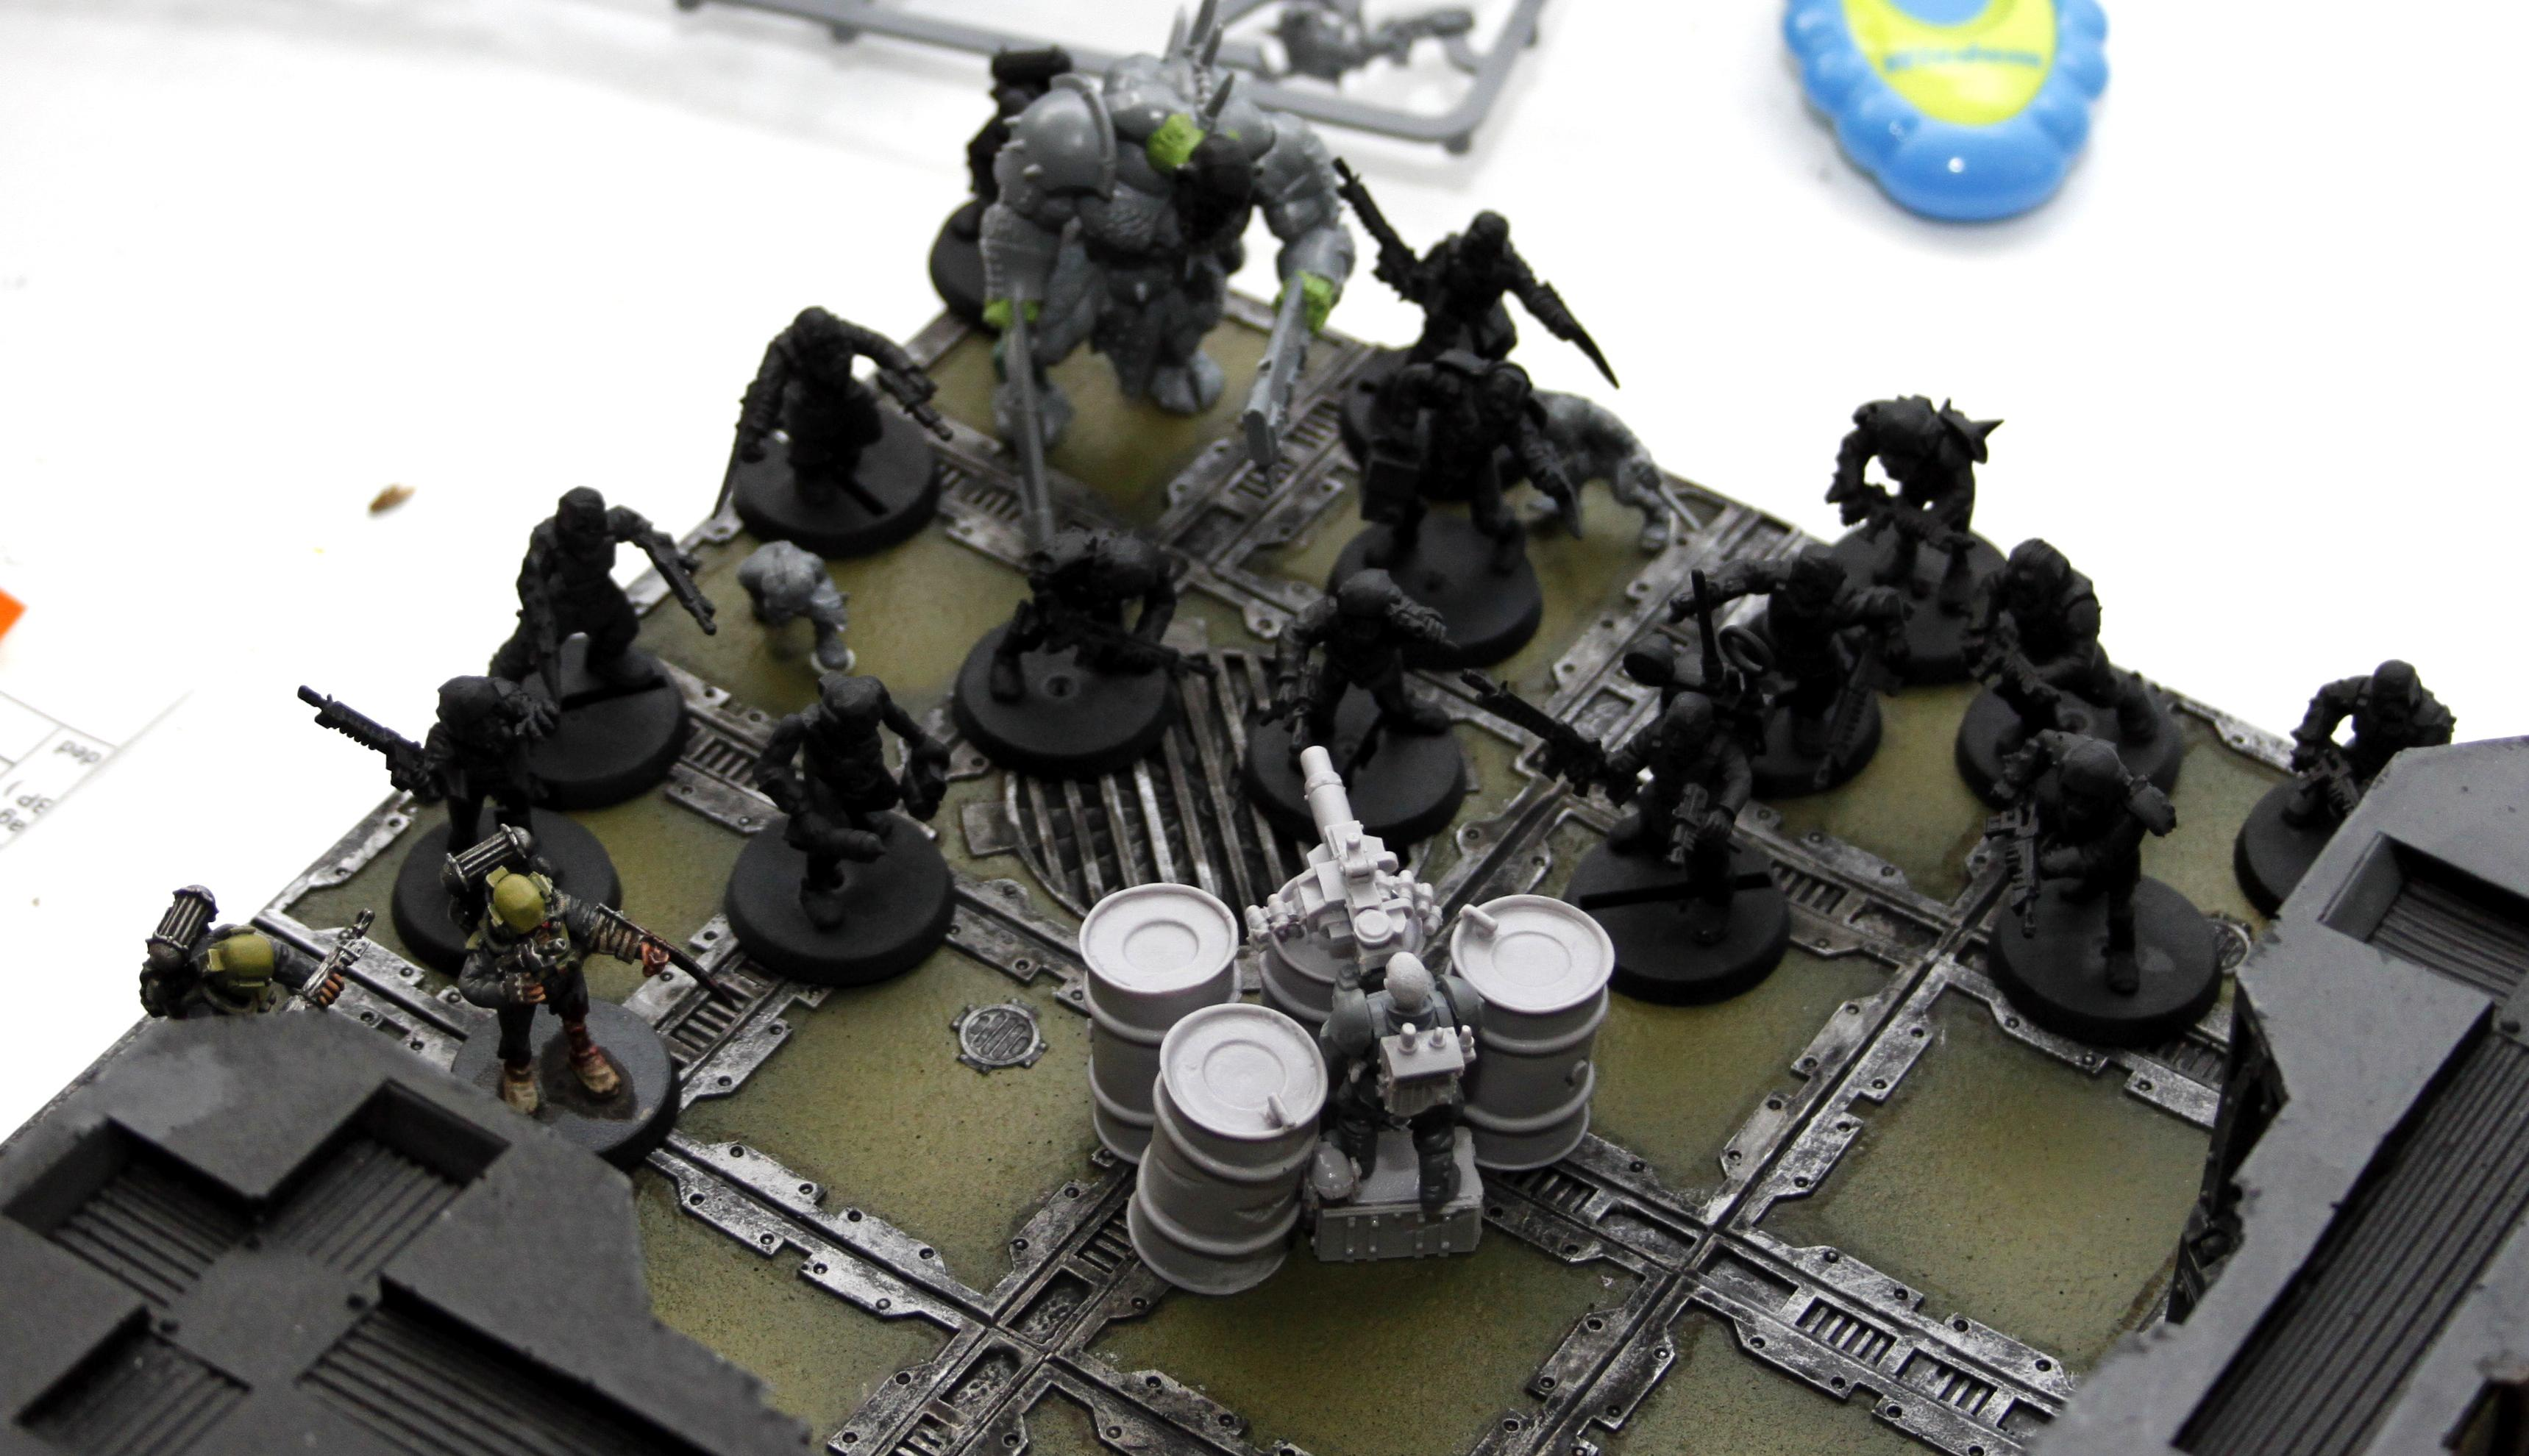 Zombies Diorama